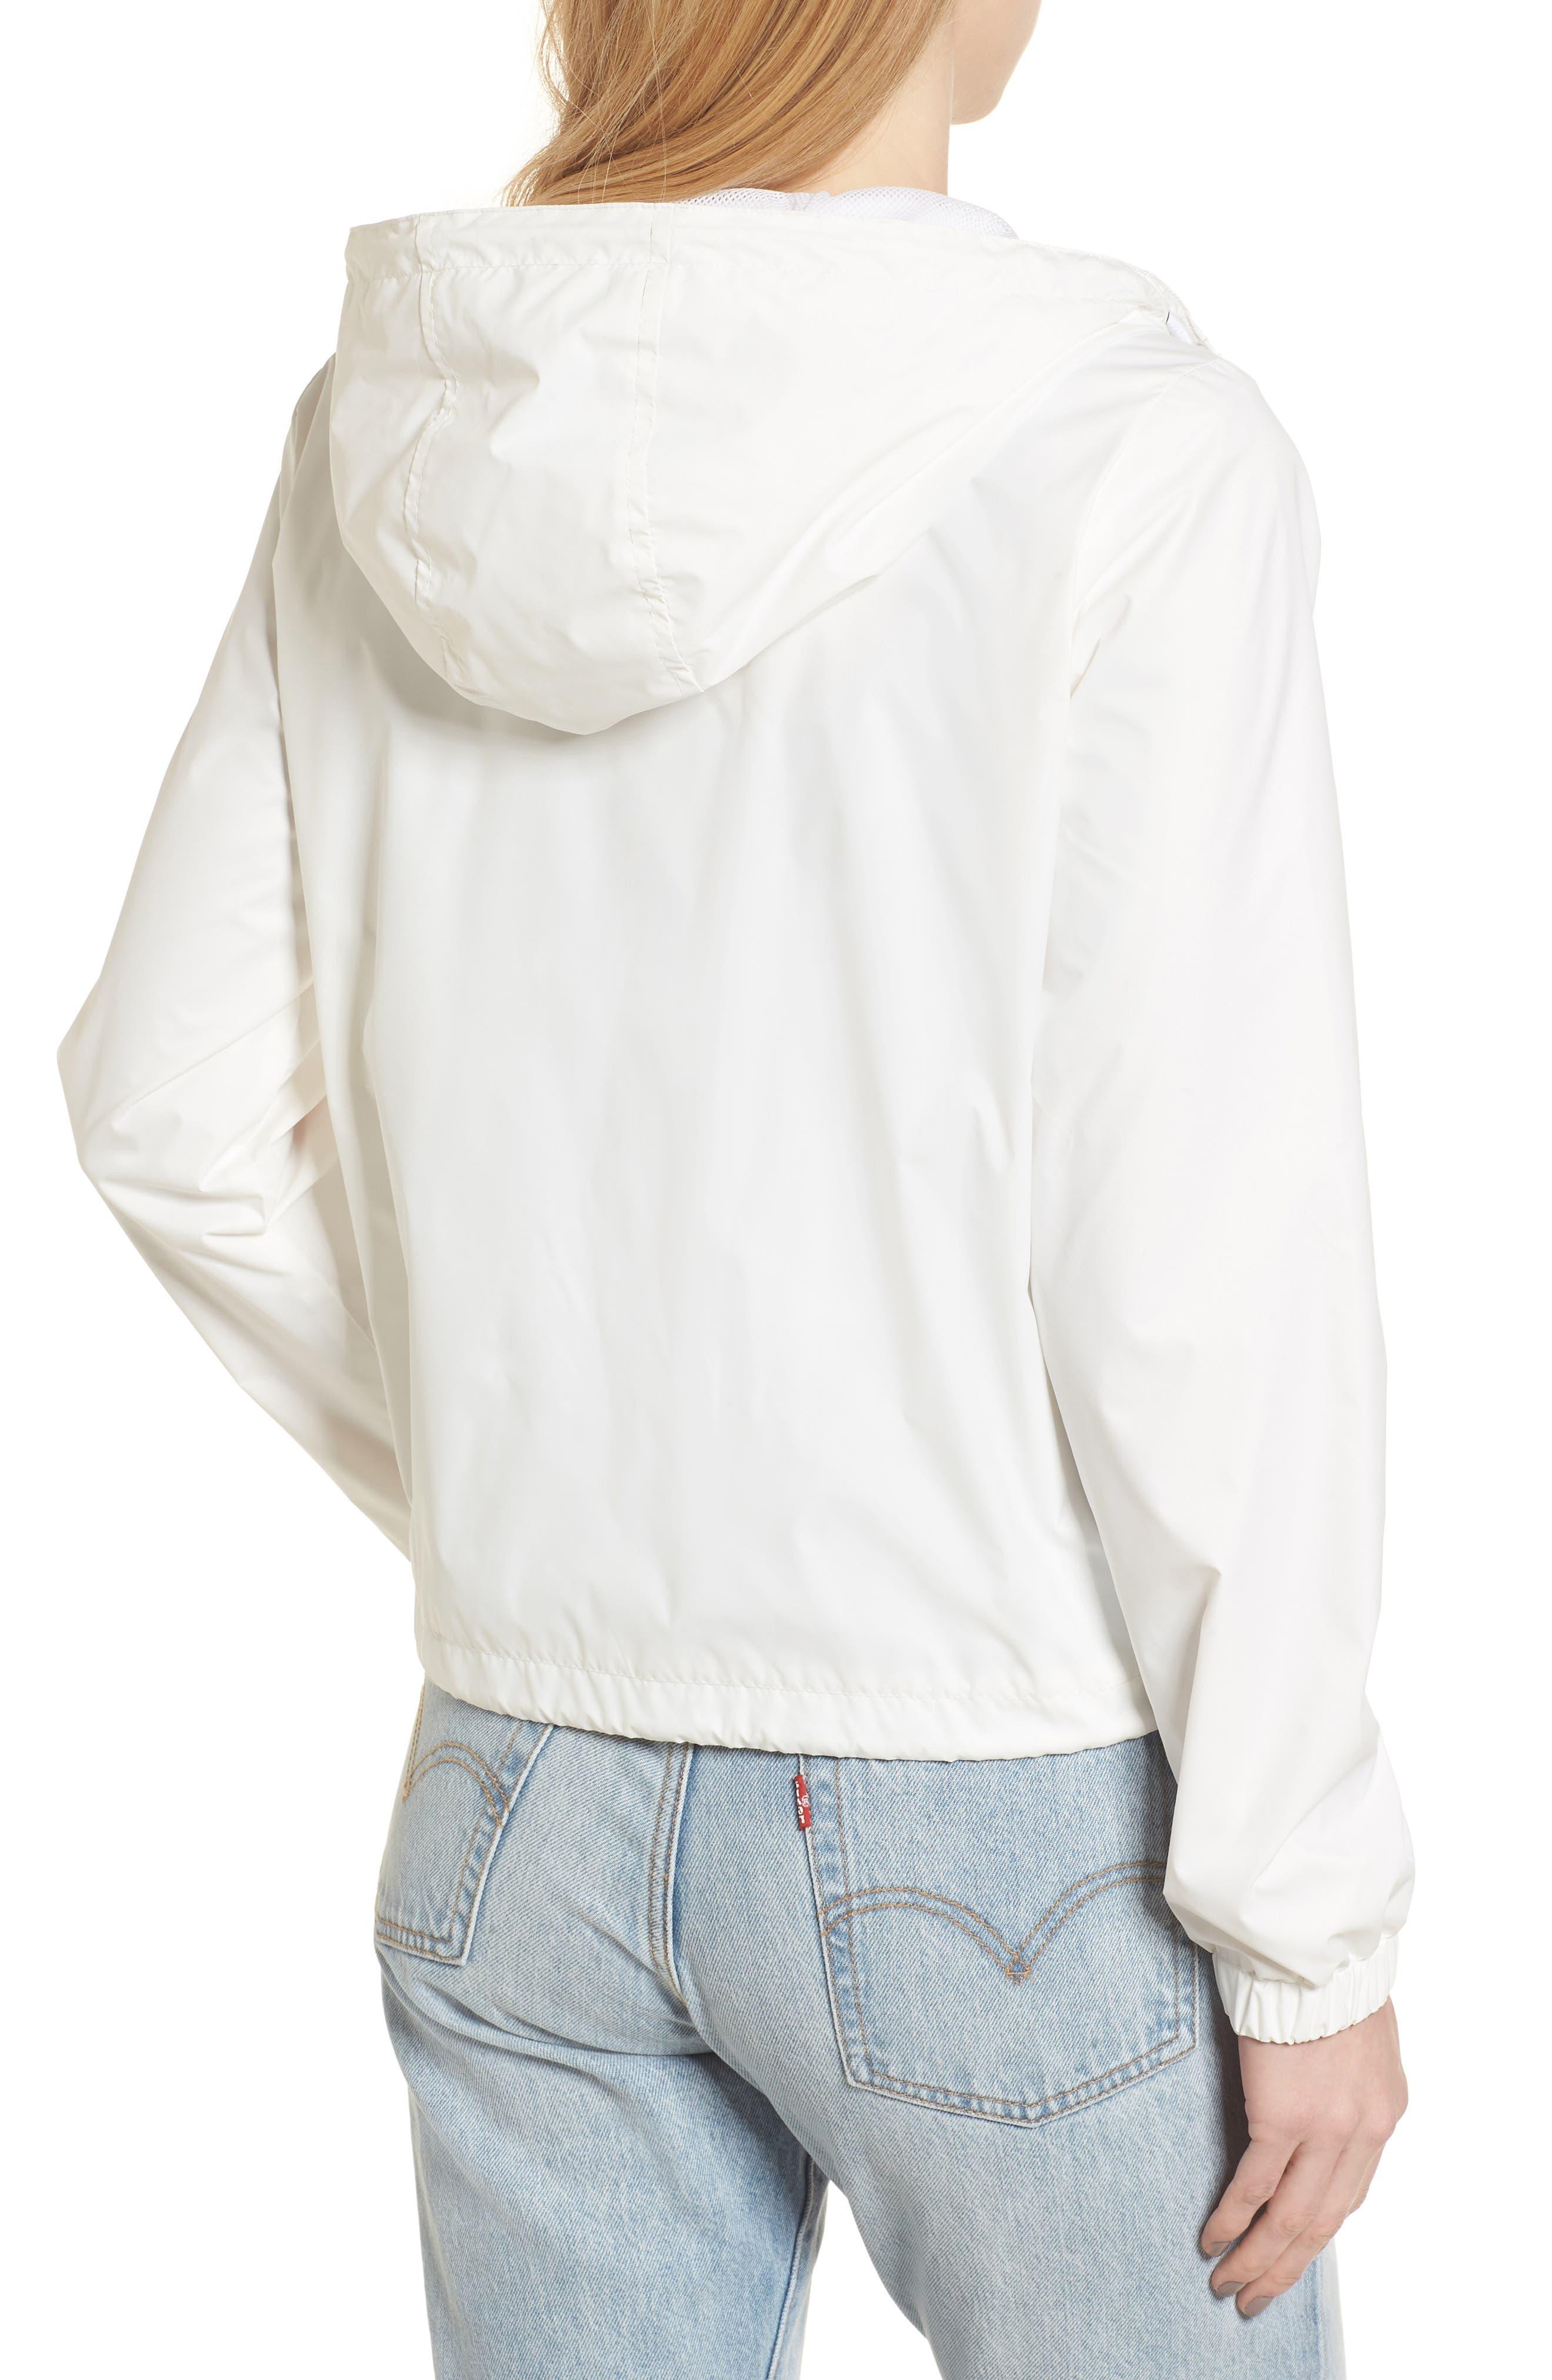 Retro Hooded Coach's Jacket,                             Alternate thumbnail 2, color,                             100